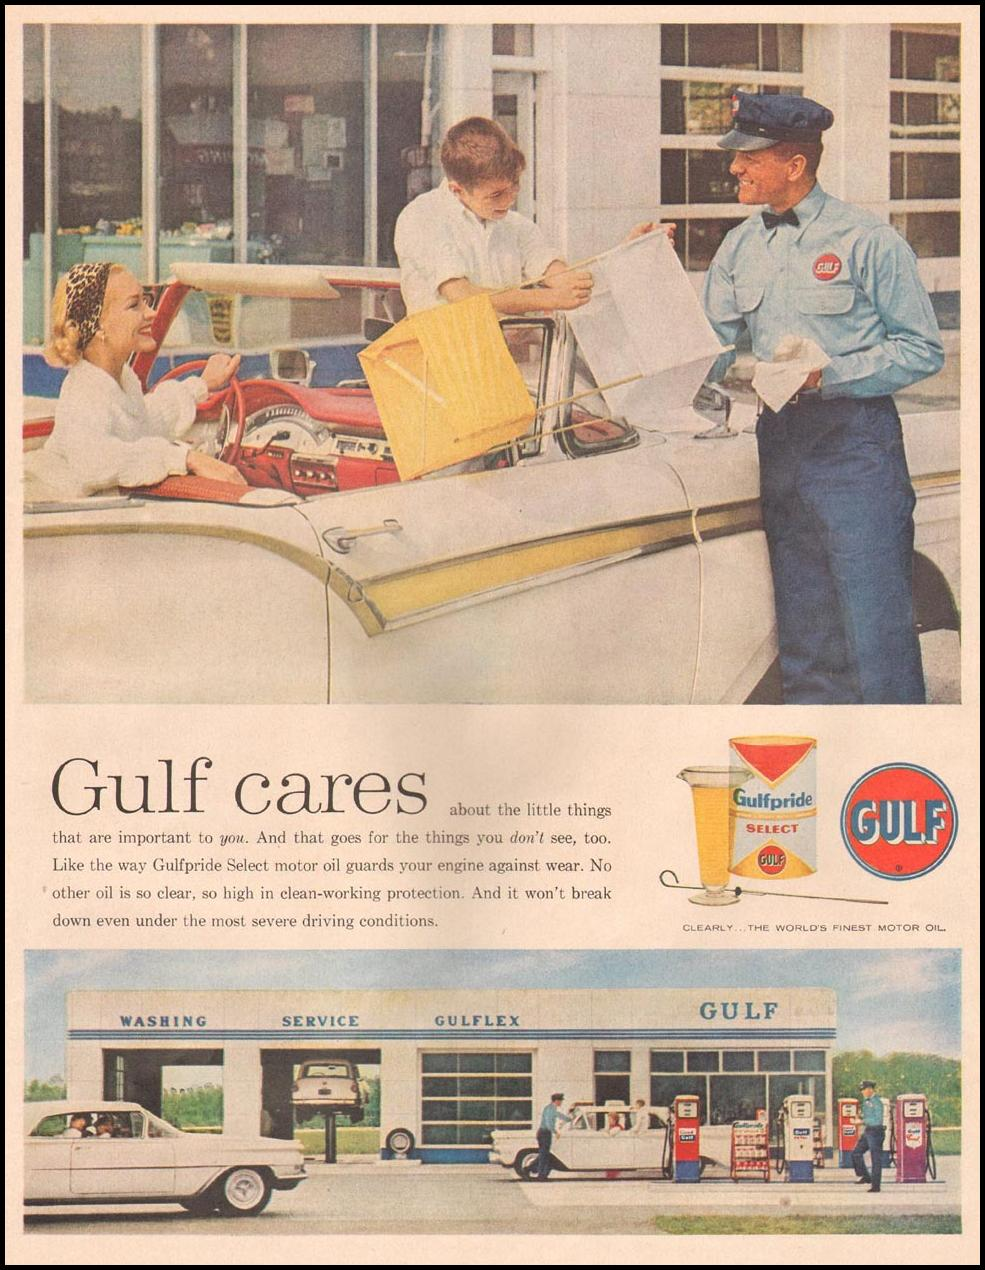 GULFPRIDE MOTOR OIL LIFE 10/05/1959